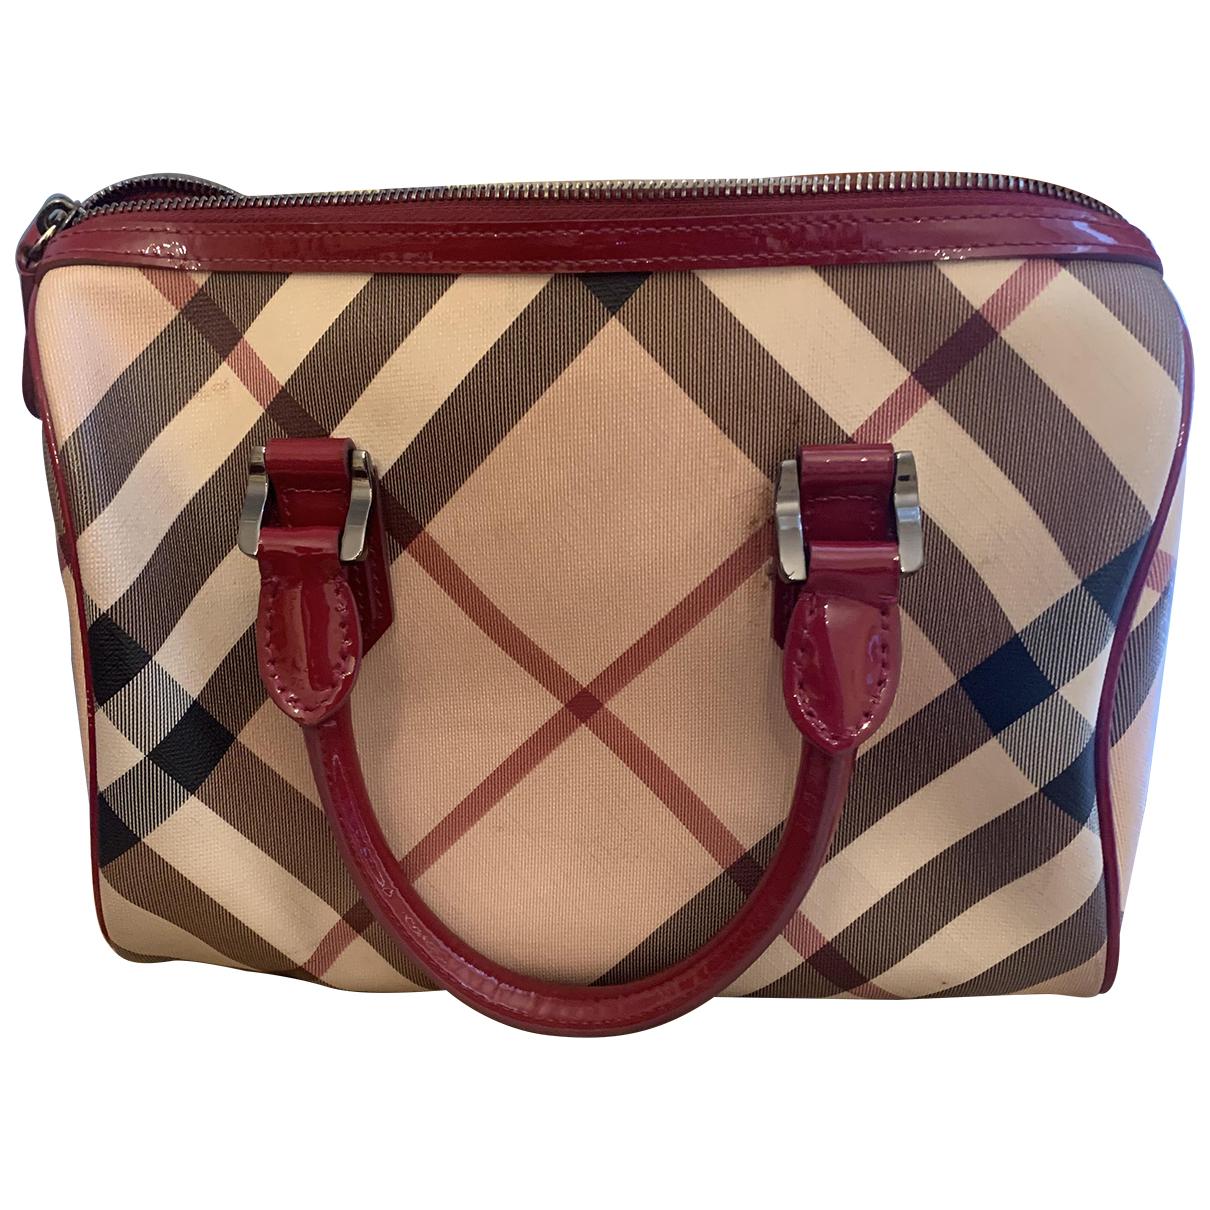 Burberry The Barrel Beige Cloth handbag for Women \N